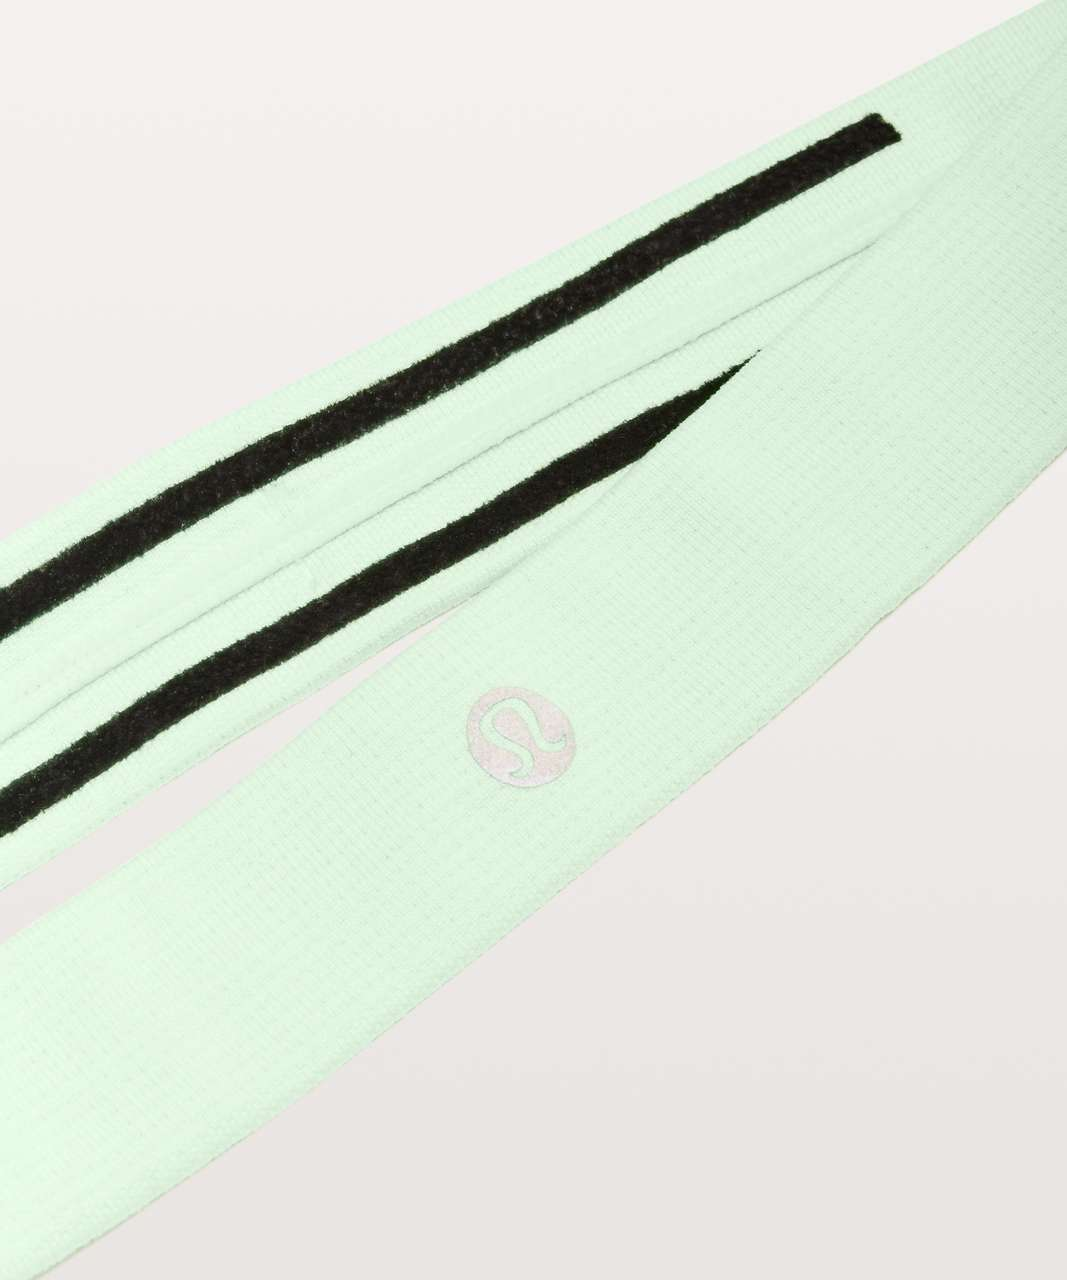 Lululemon Cardio Cross Trainer Headband - Citra Lime / White